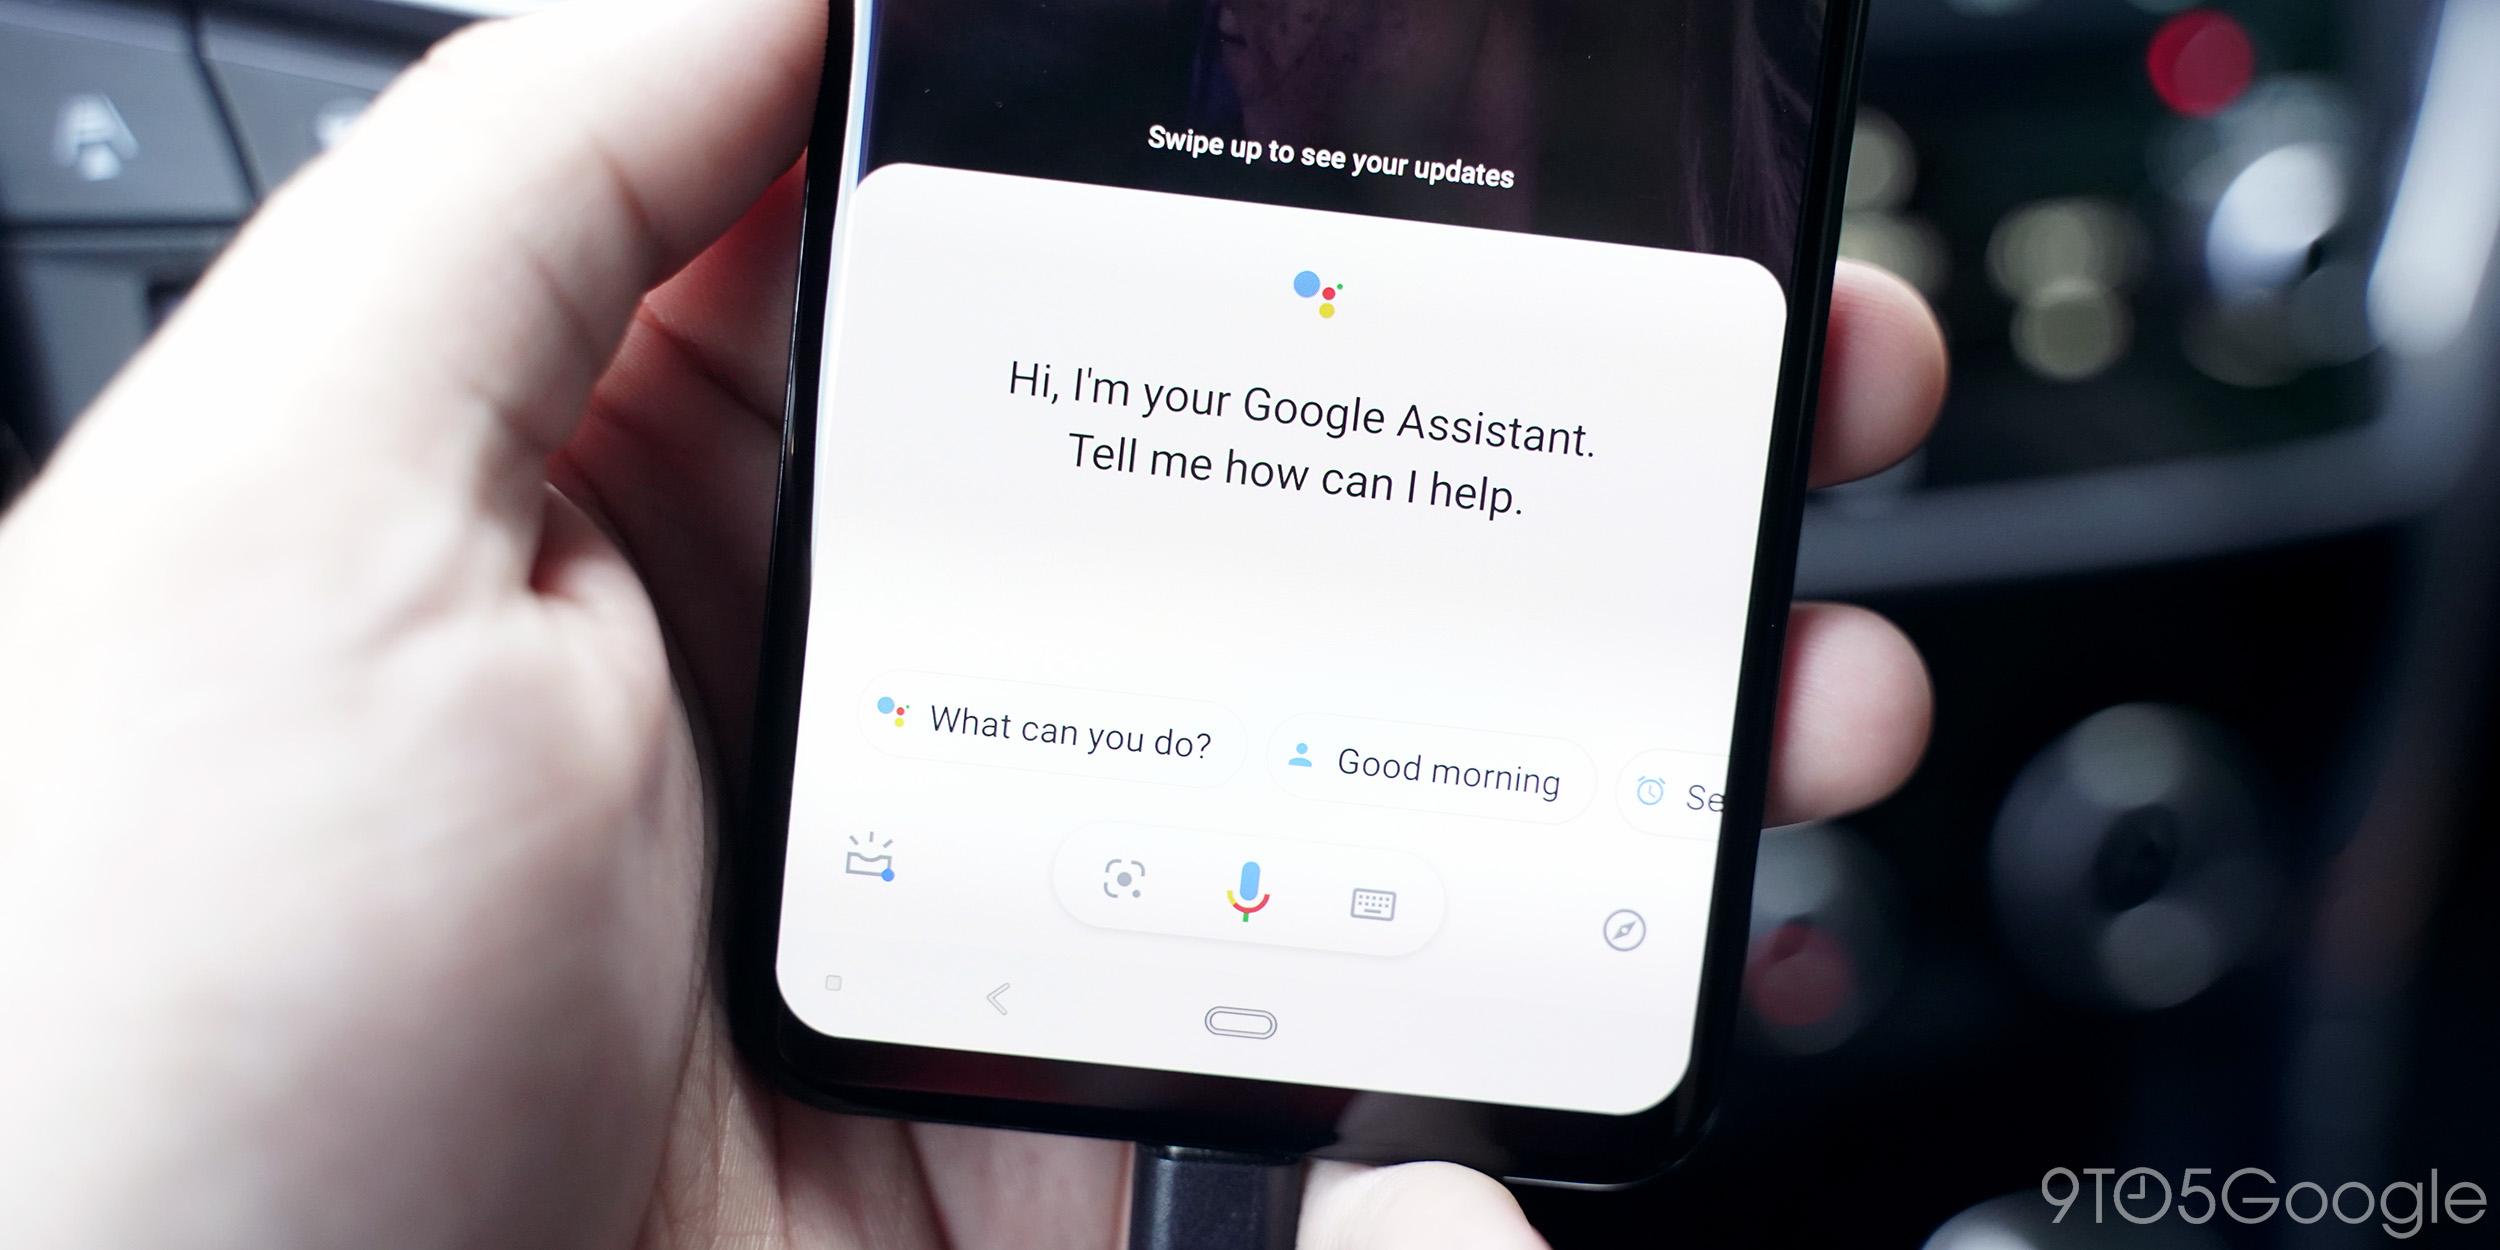 assistant car google i/o 2019